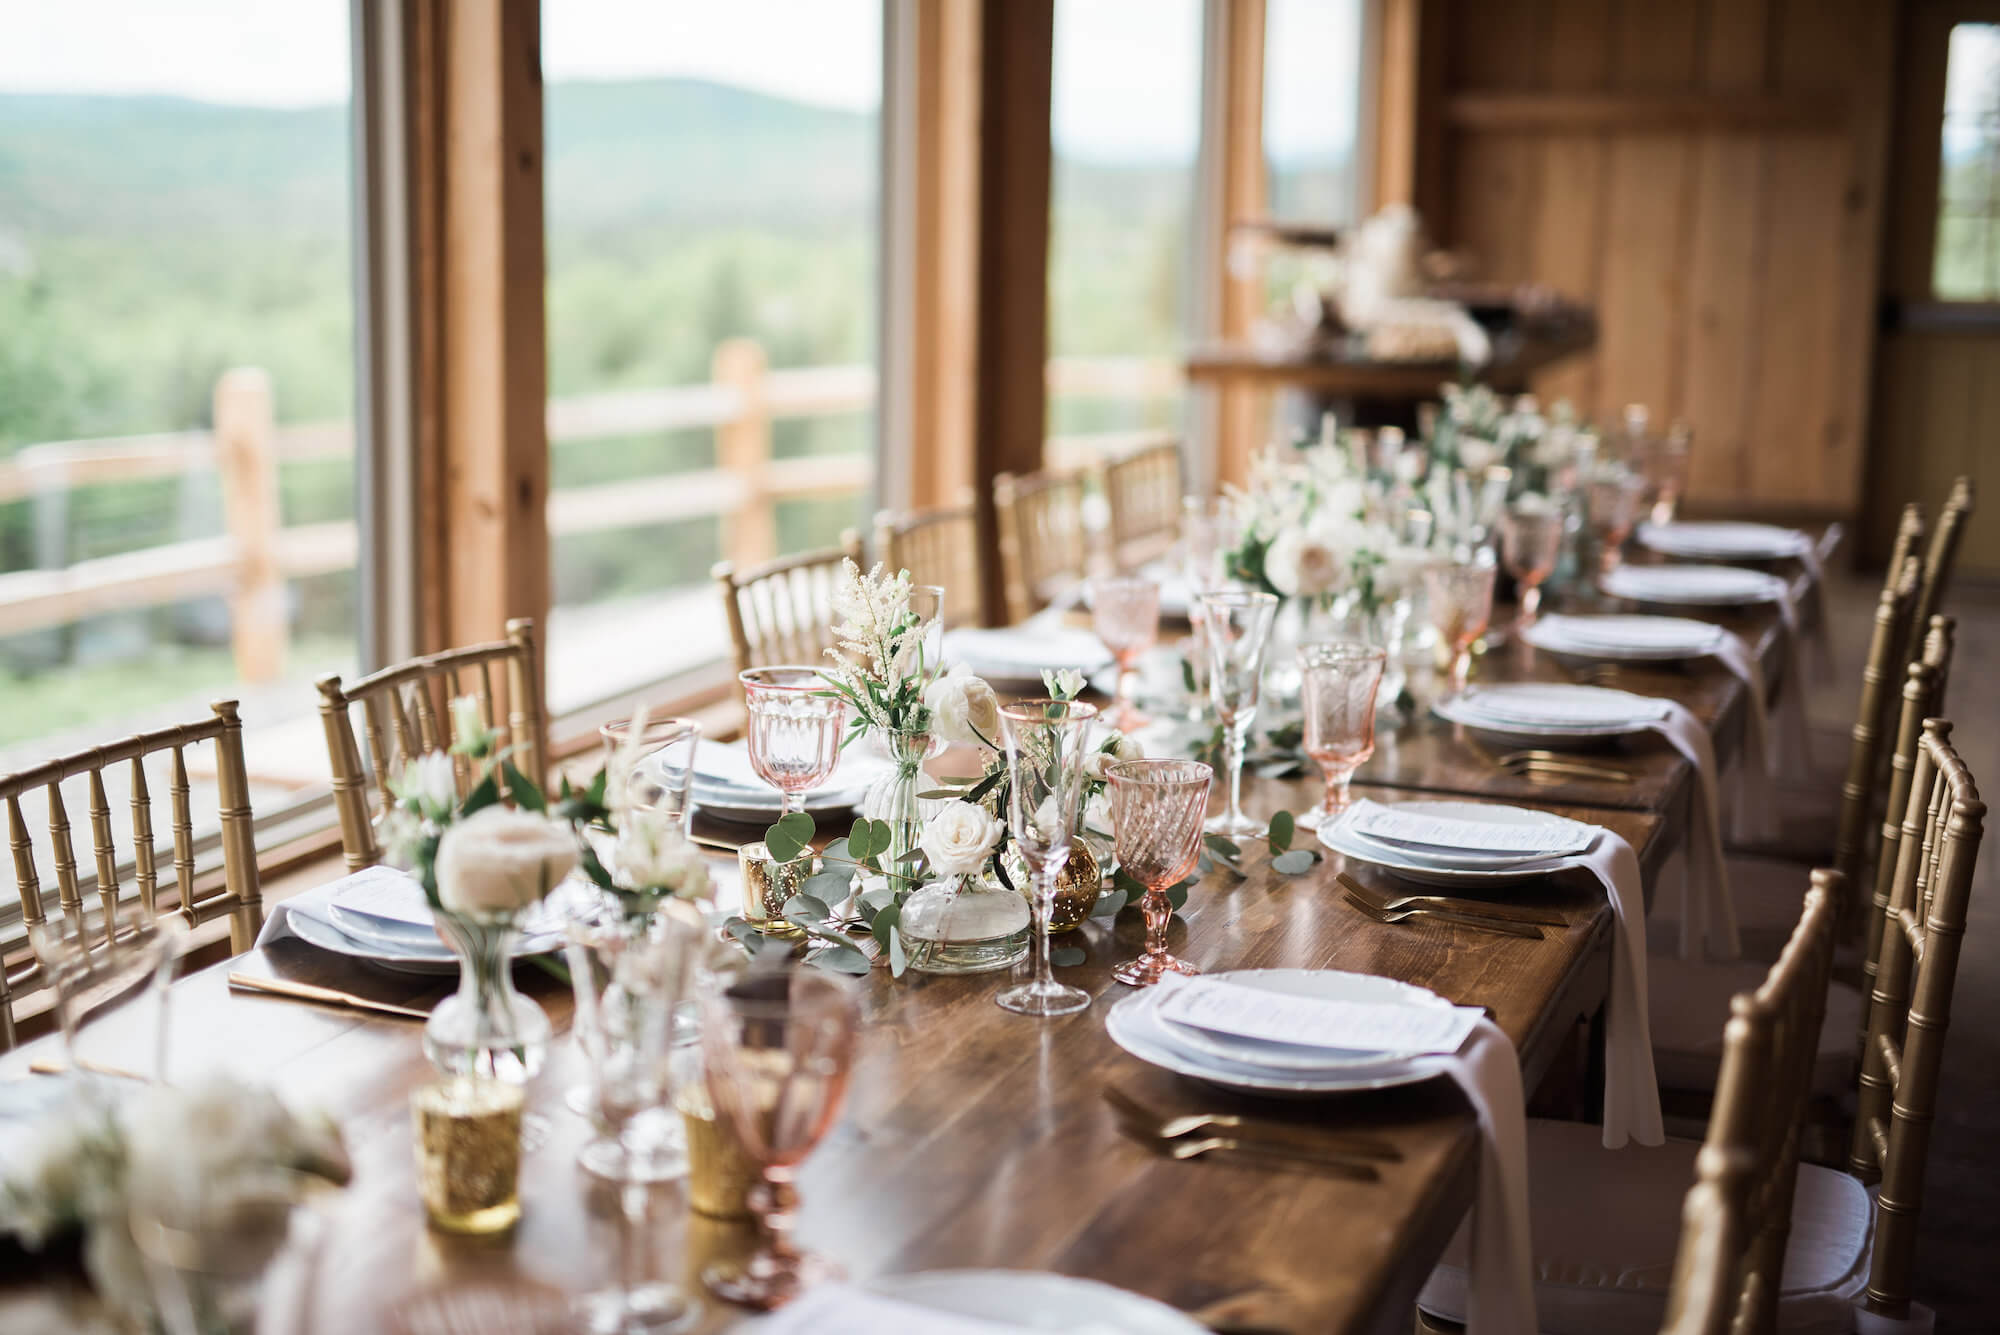 rustic-chic-tablescape-barn-wedding.jpg